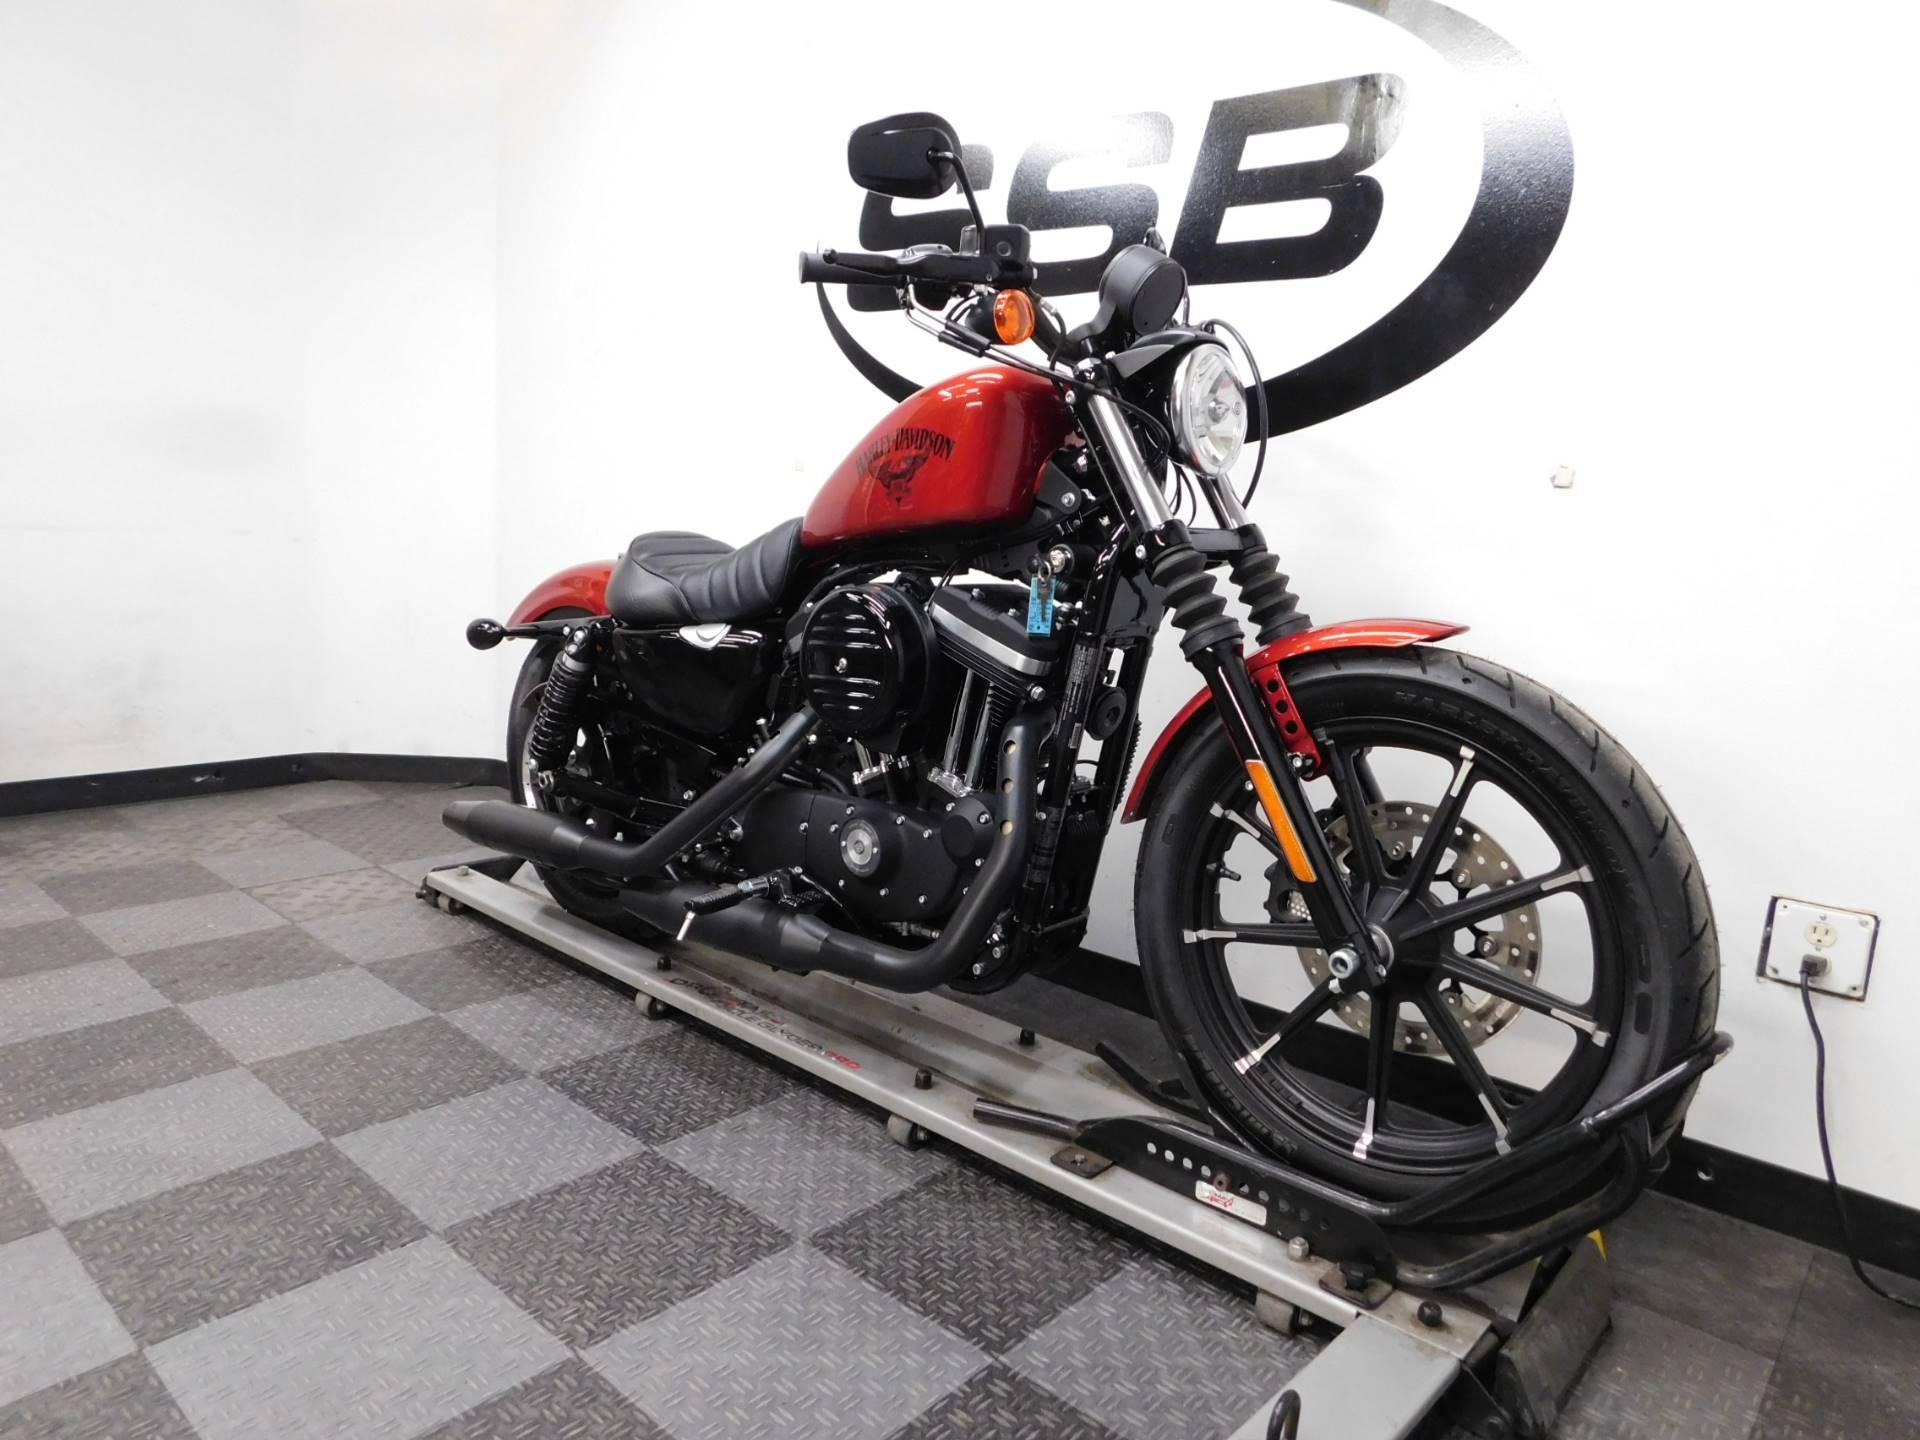 2018 Harley-Davidson Iron 883 2